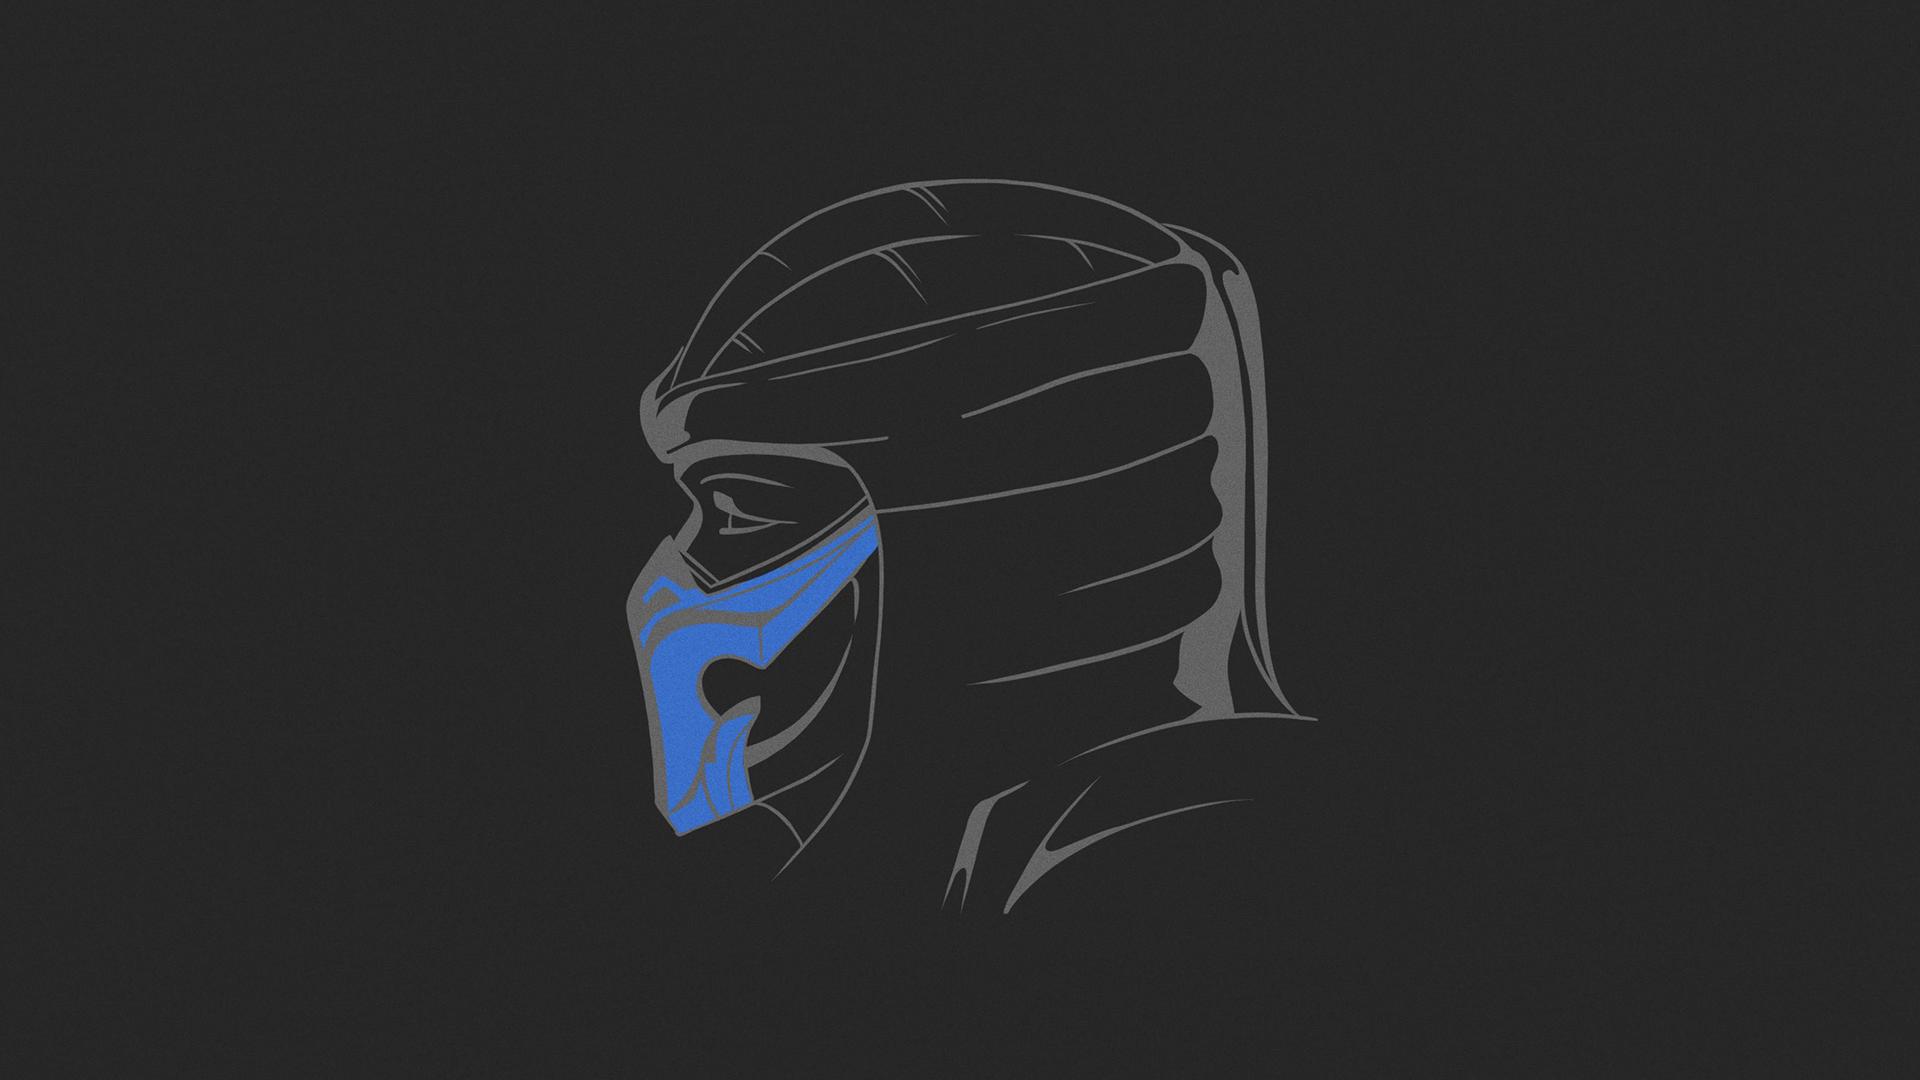 General 1920x1080 Mortal Kombat Mortal Kombat 11 simple simple background Sub Zero